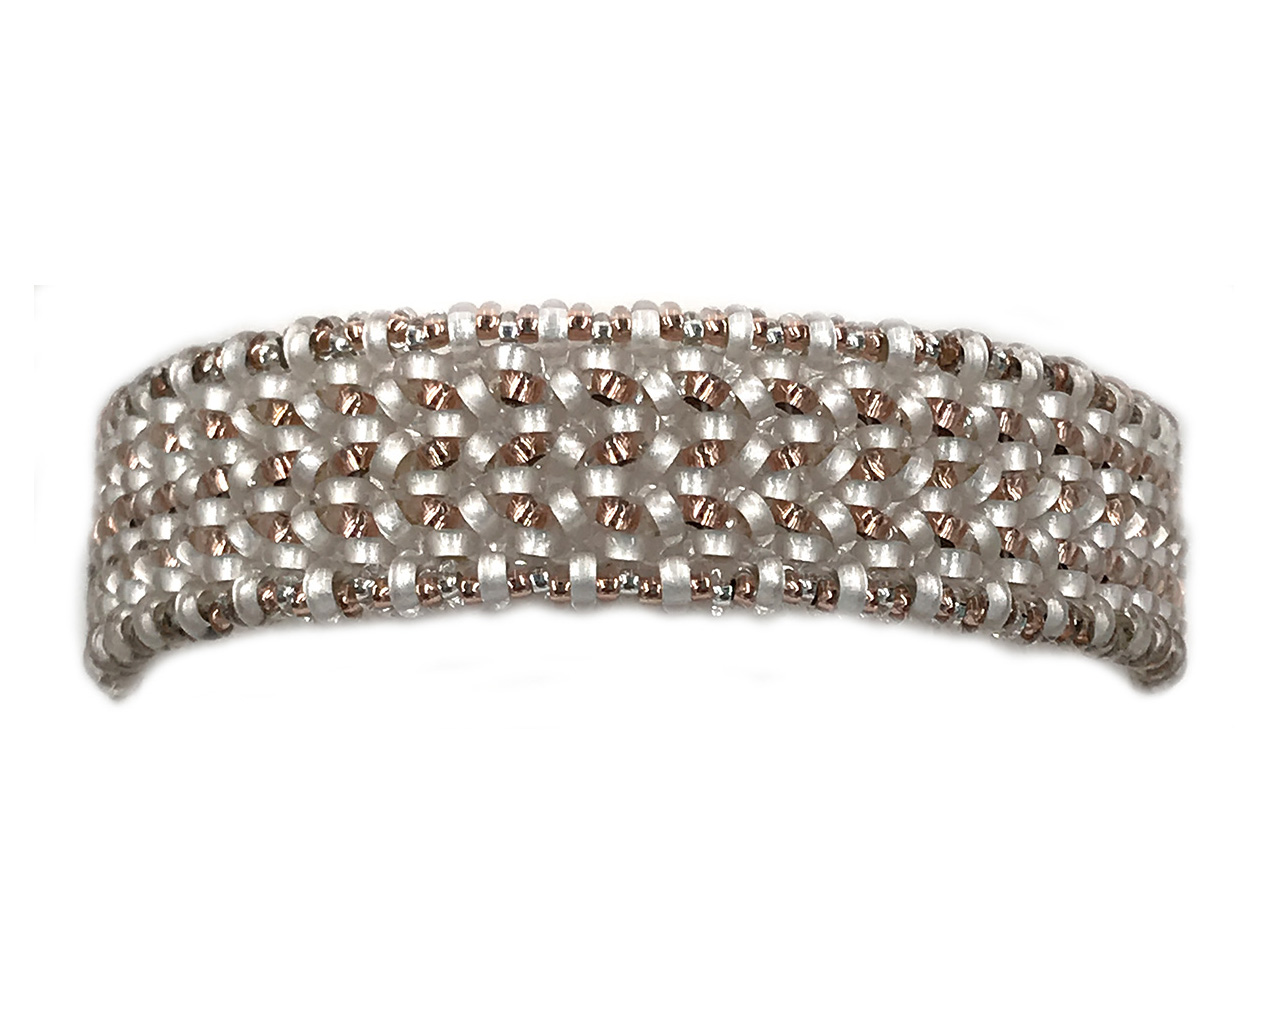 Pirelli Bracelet Tutorial